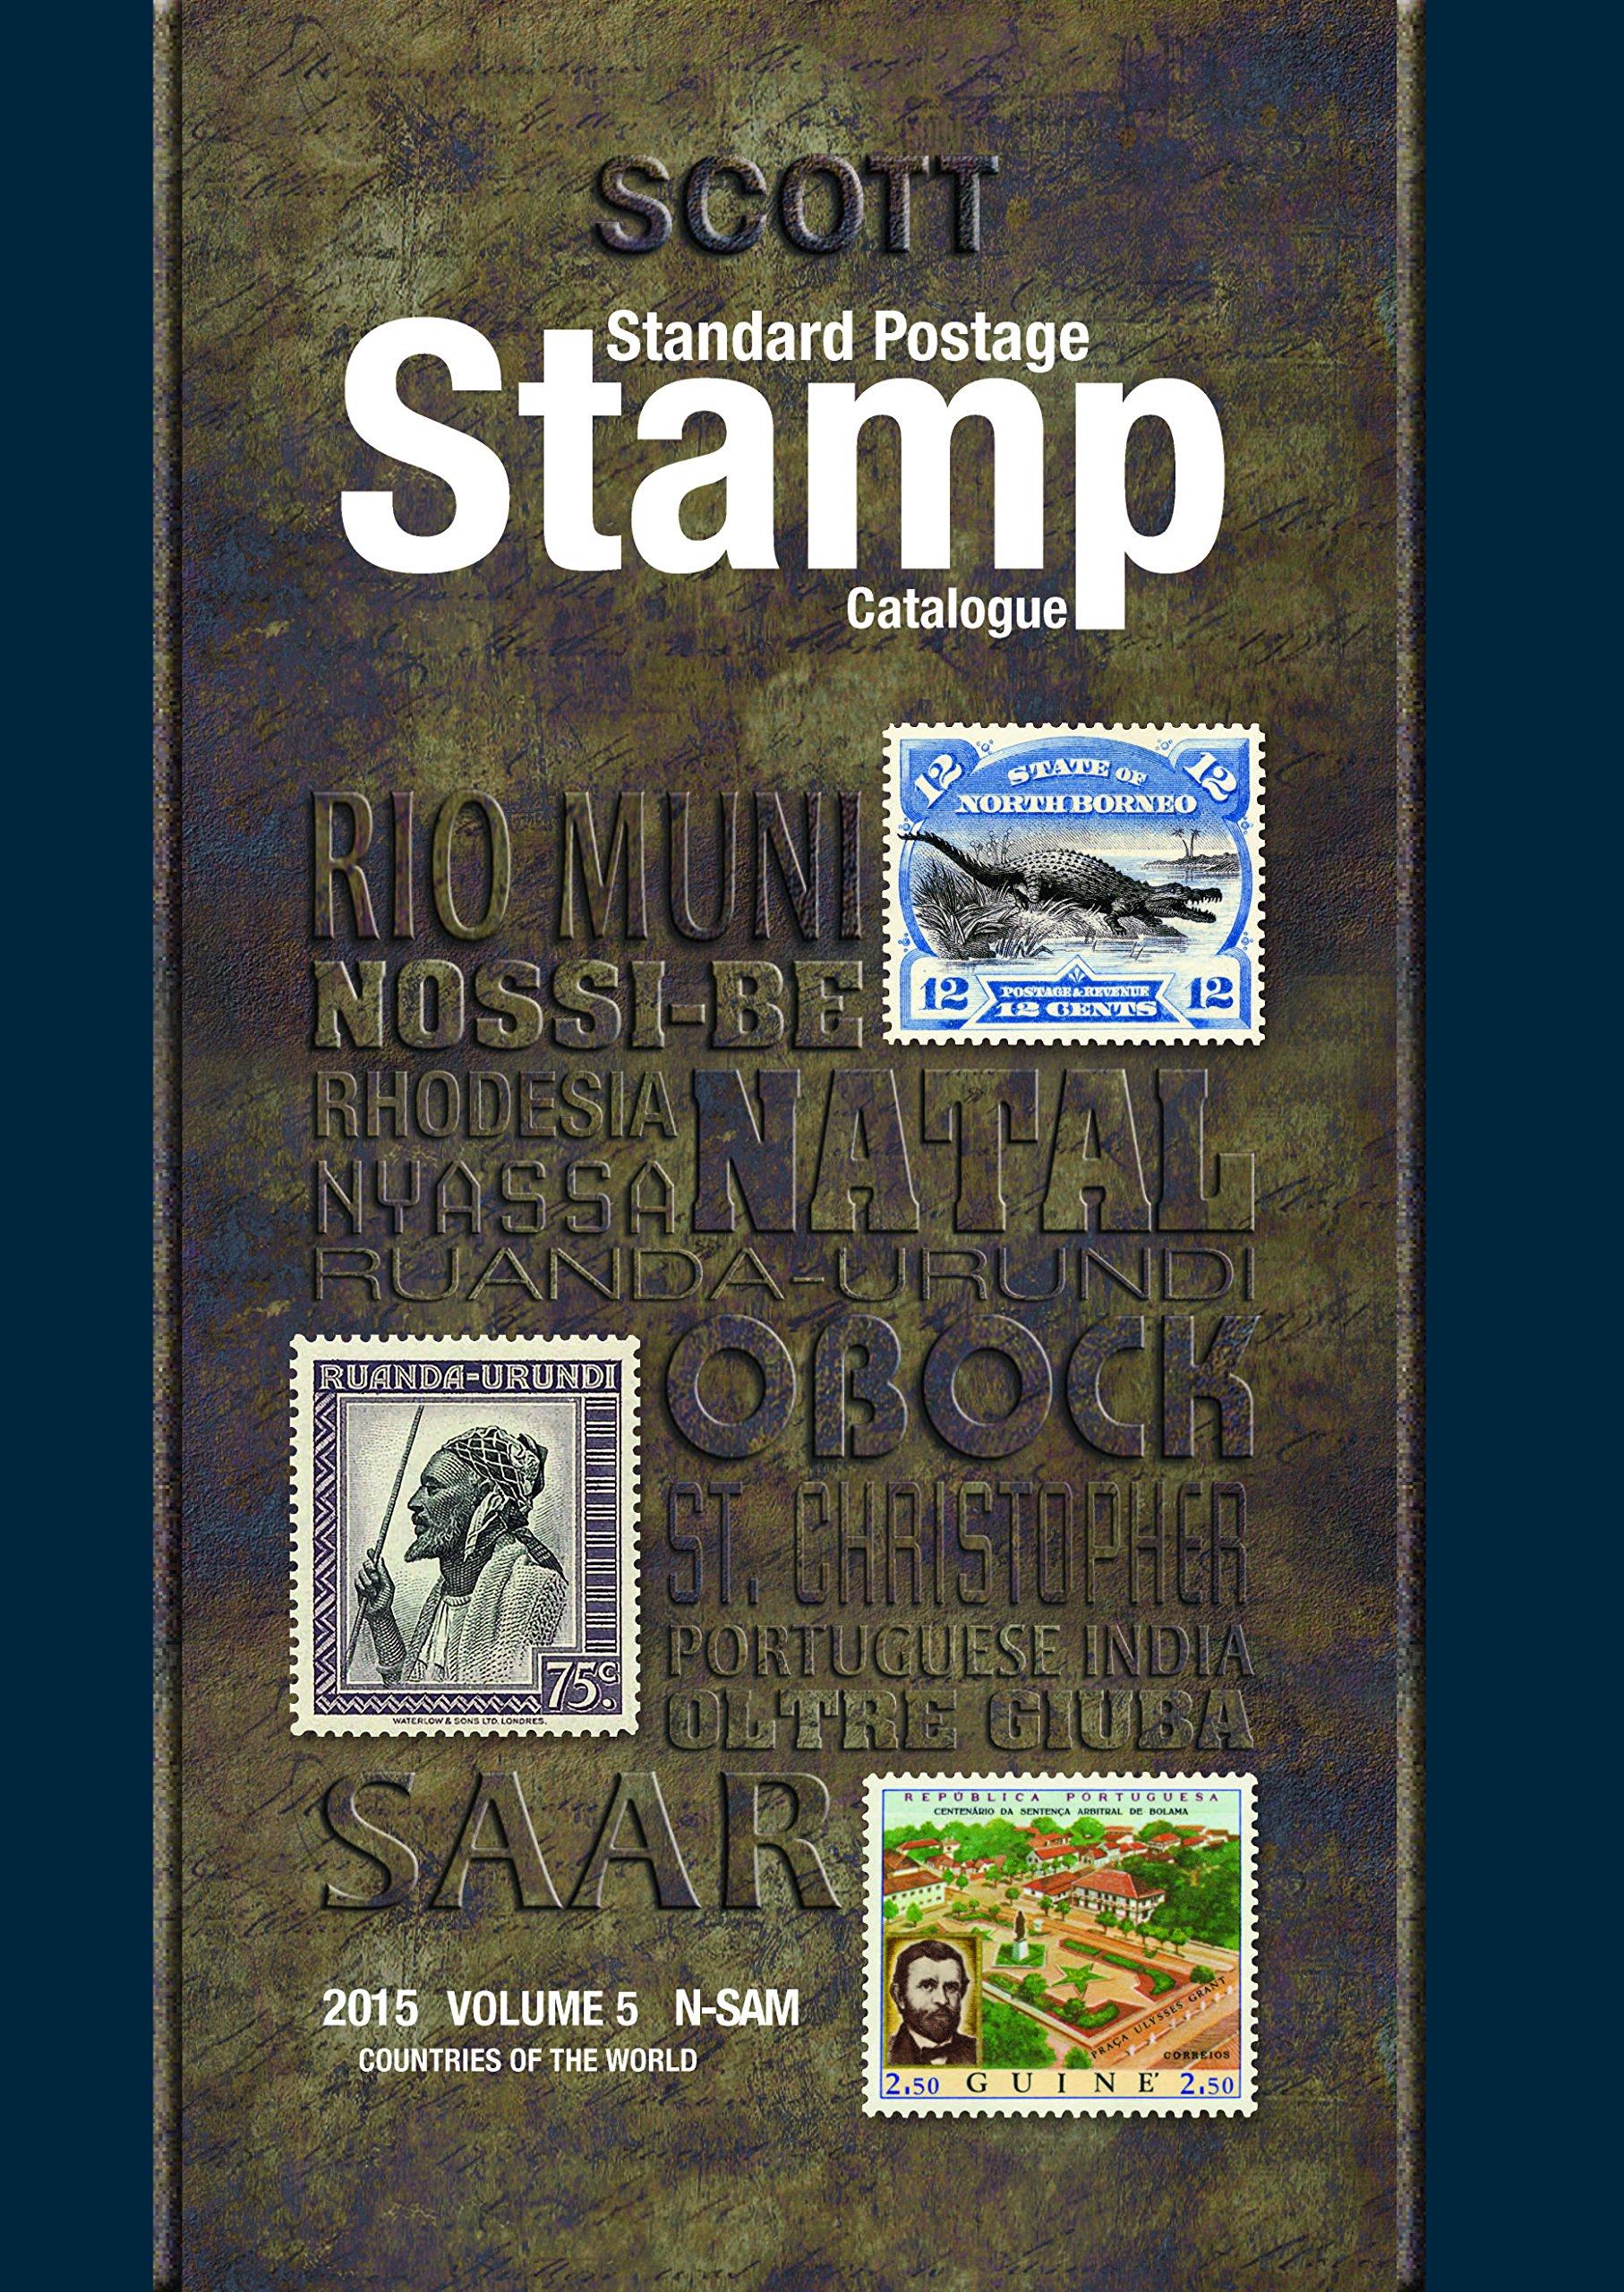 Scott 2015 Standard Postage Stamp Catalogue Volume 5: Countries of the World N-Sam (Scott Standard Postage Stamp Catalogue Vol 5 Countries N-Sam)